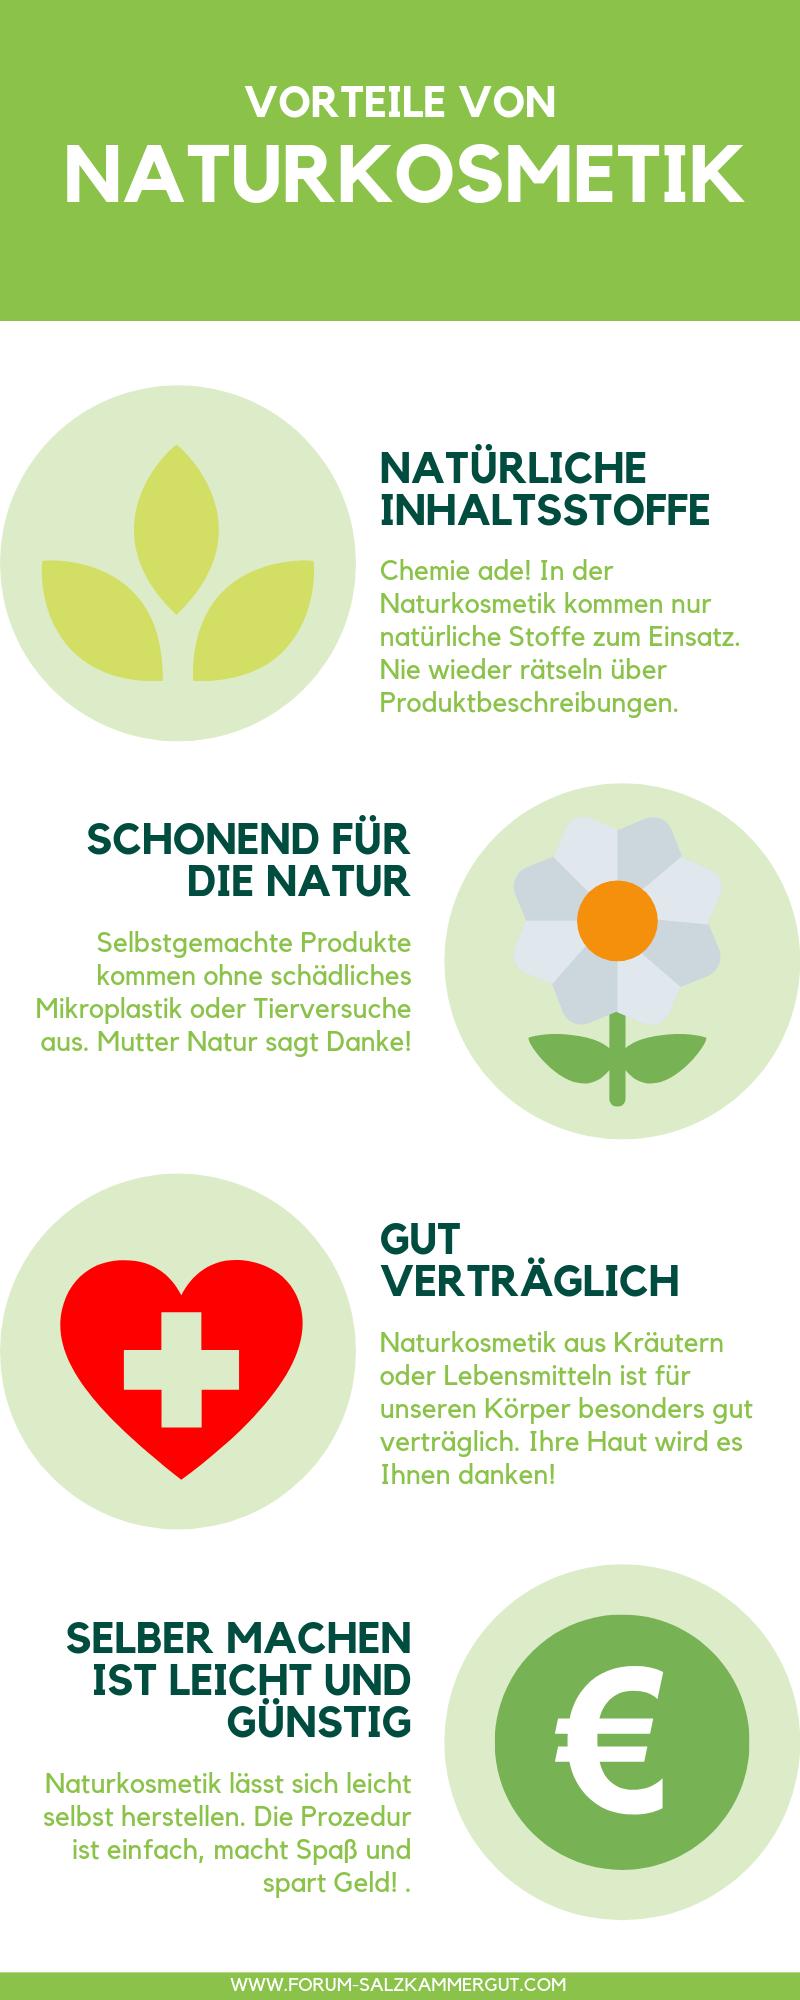 Infografik Naturkosmetik Vorteile